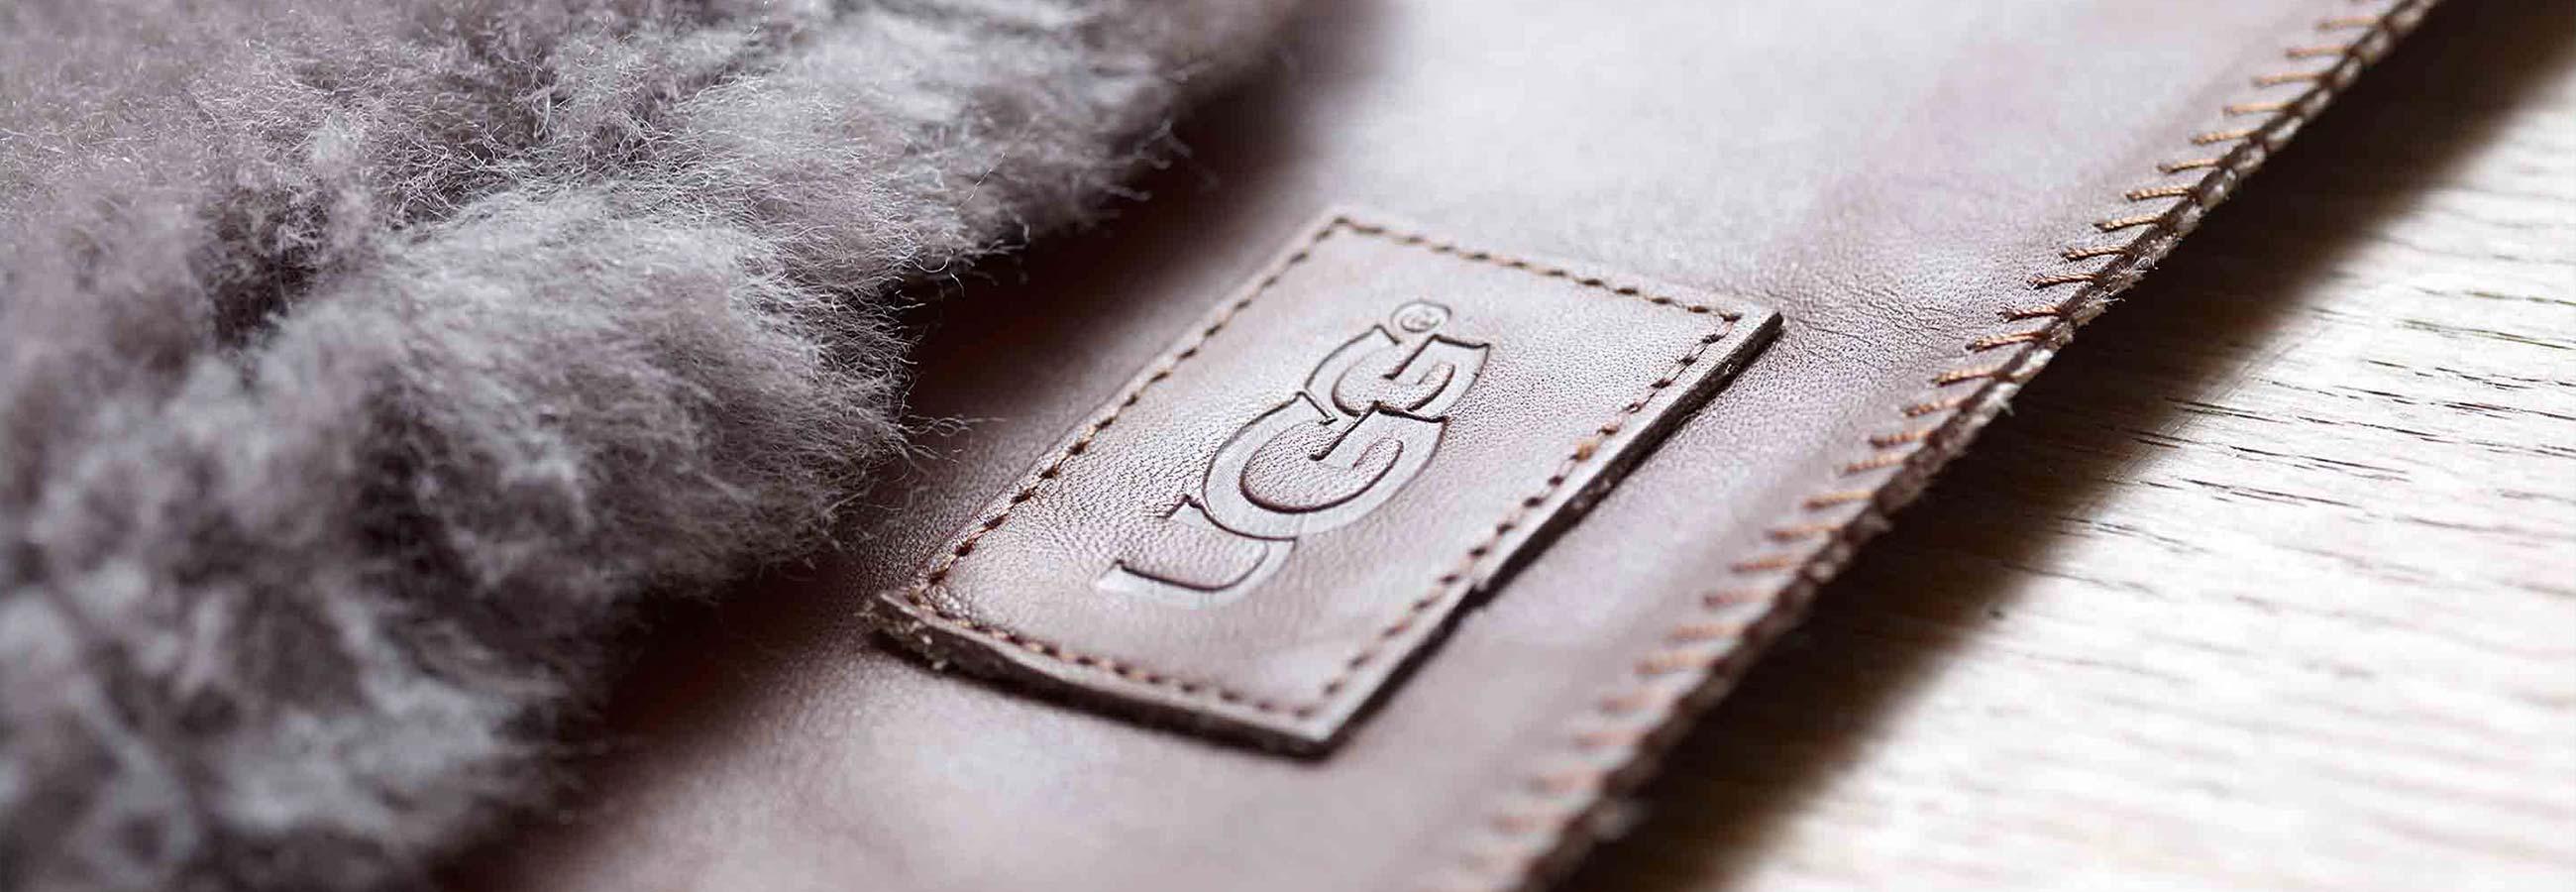 UGG brand label close up